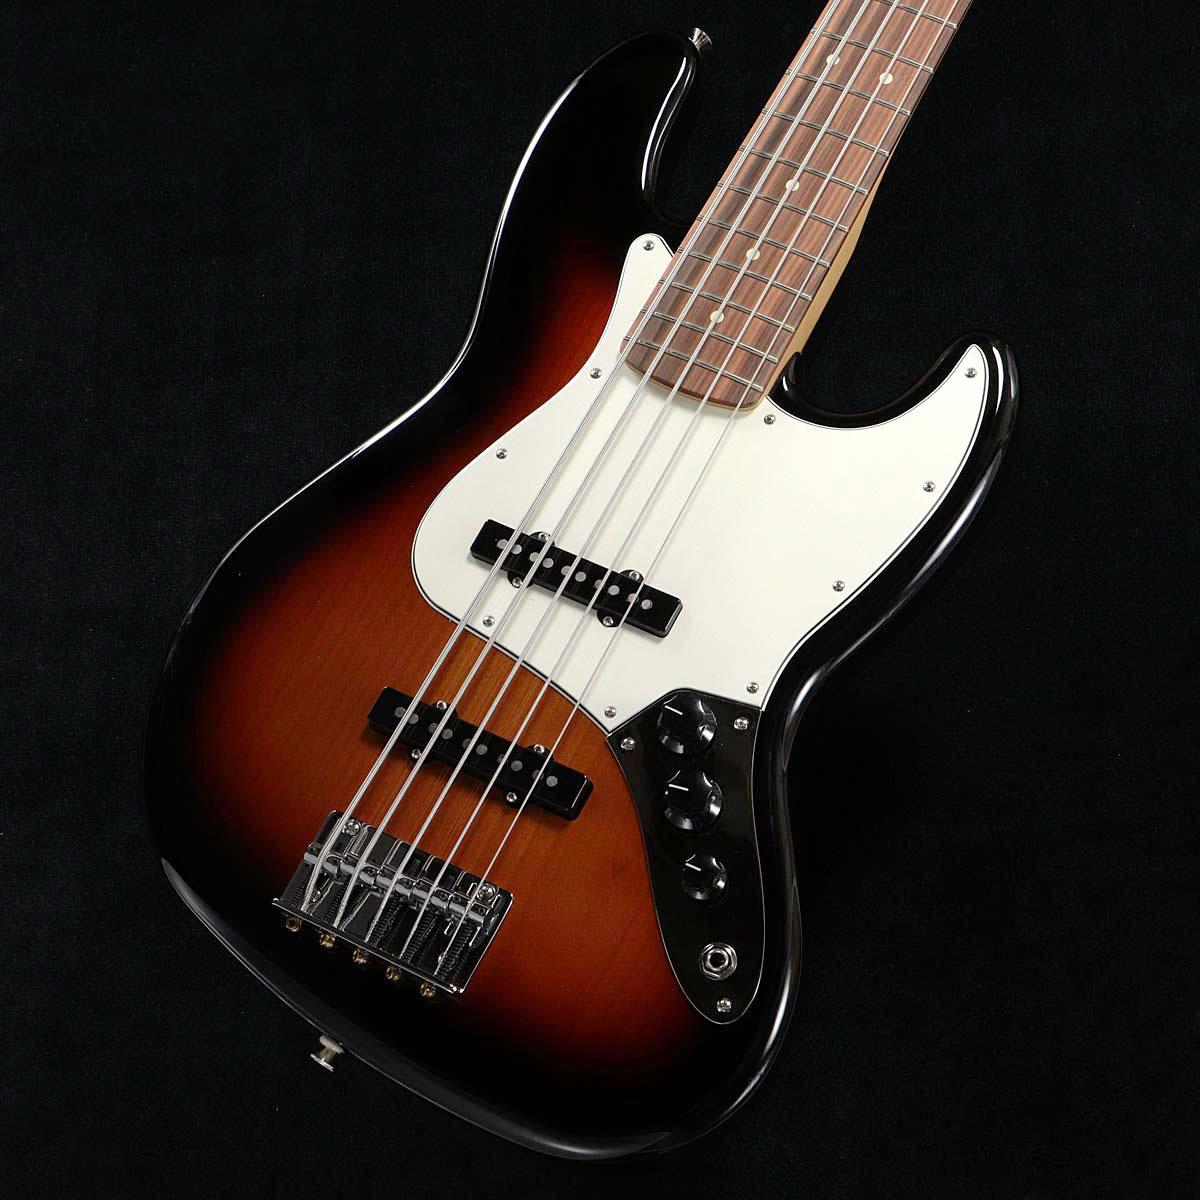 FENDER MEXICO フェンダーメキシコ / Player Jazz Bass V Pau Ferro /3TS【御茶ノ水本店】